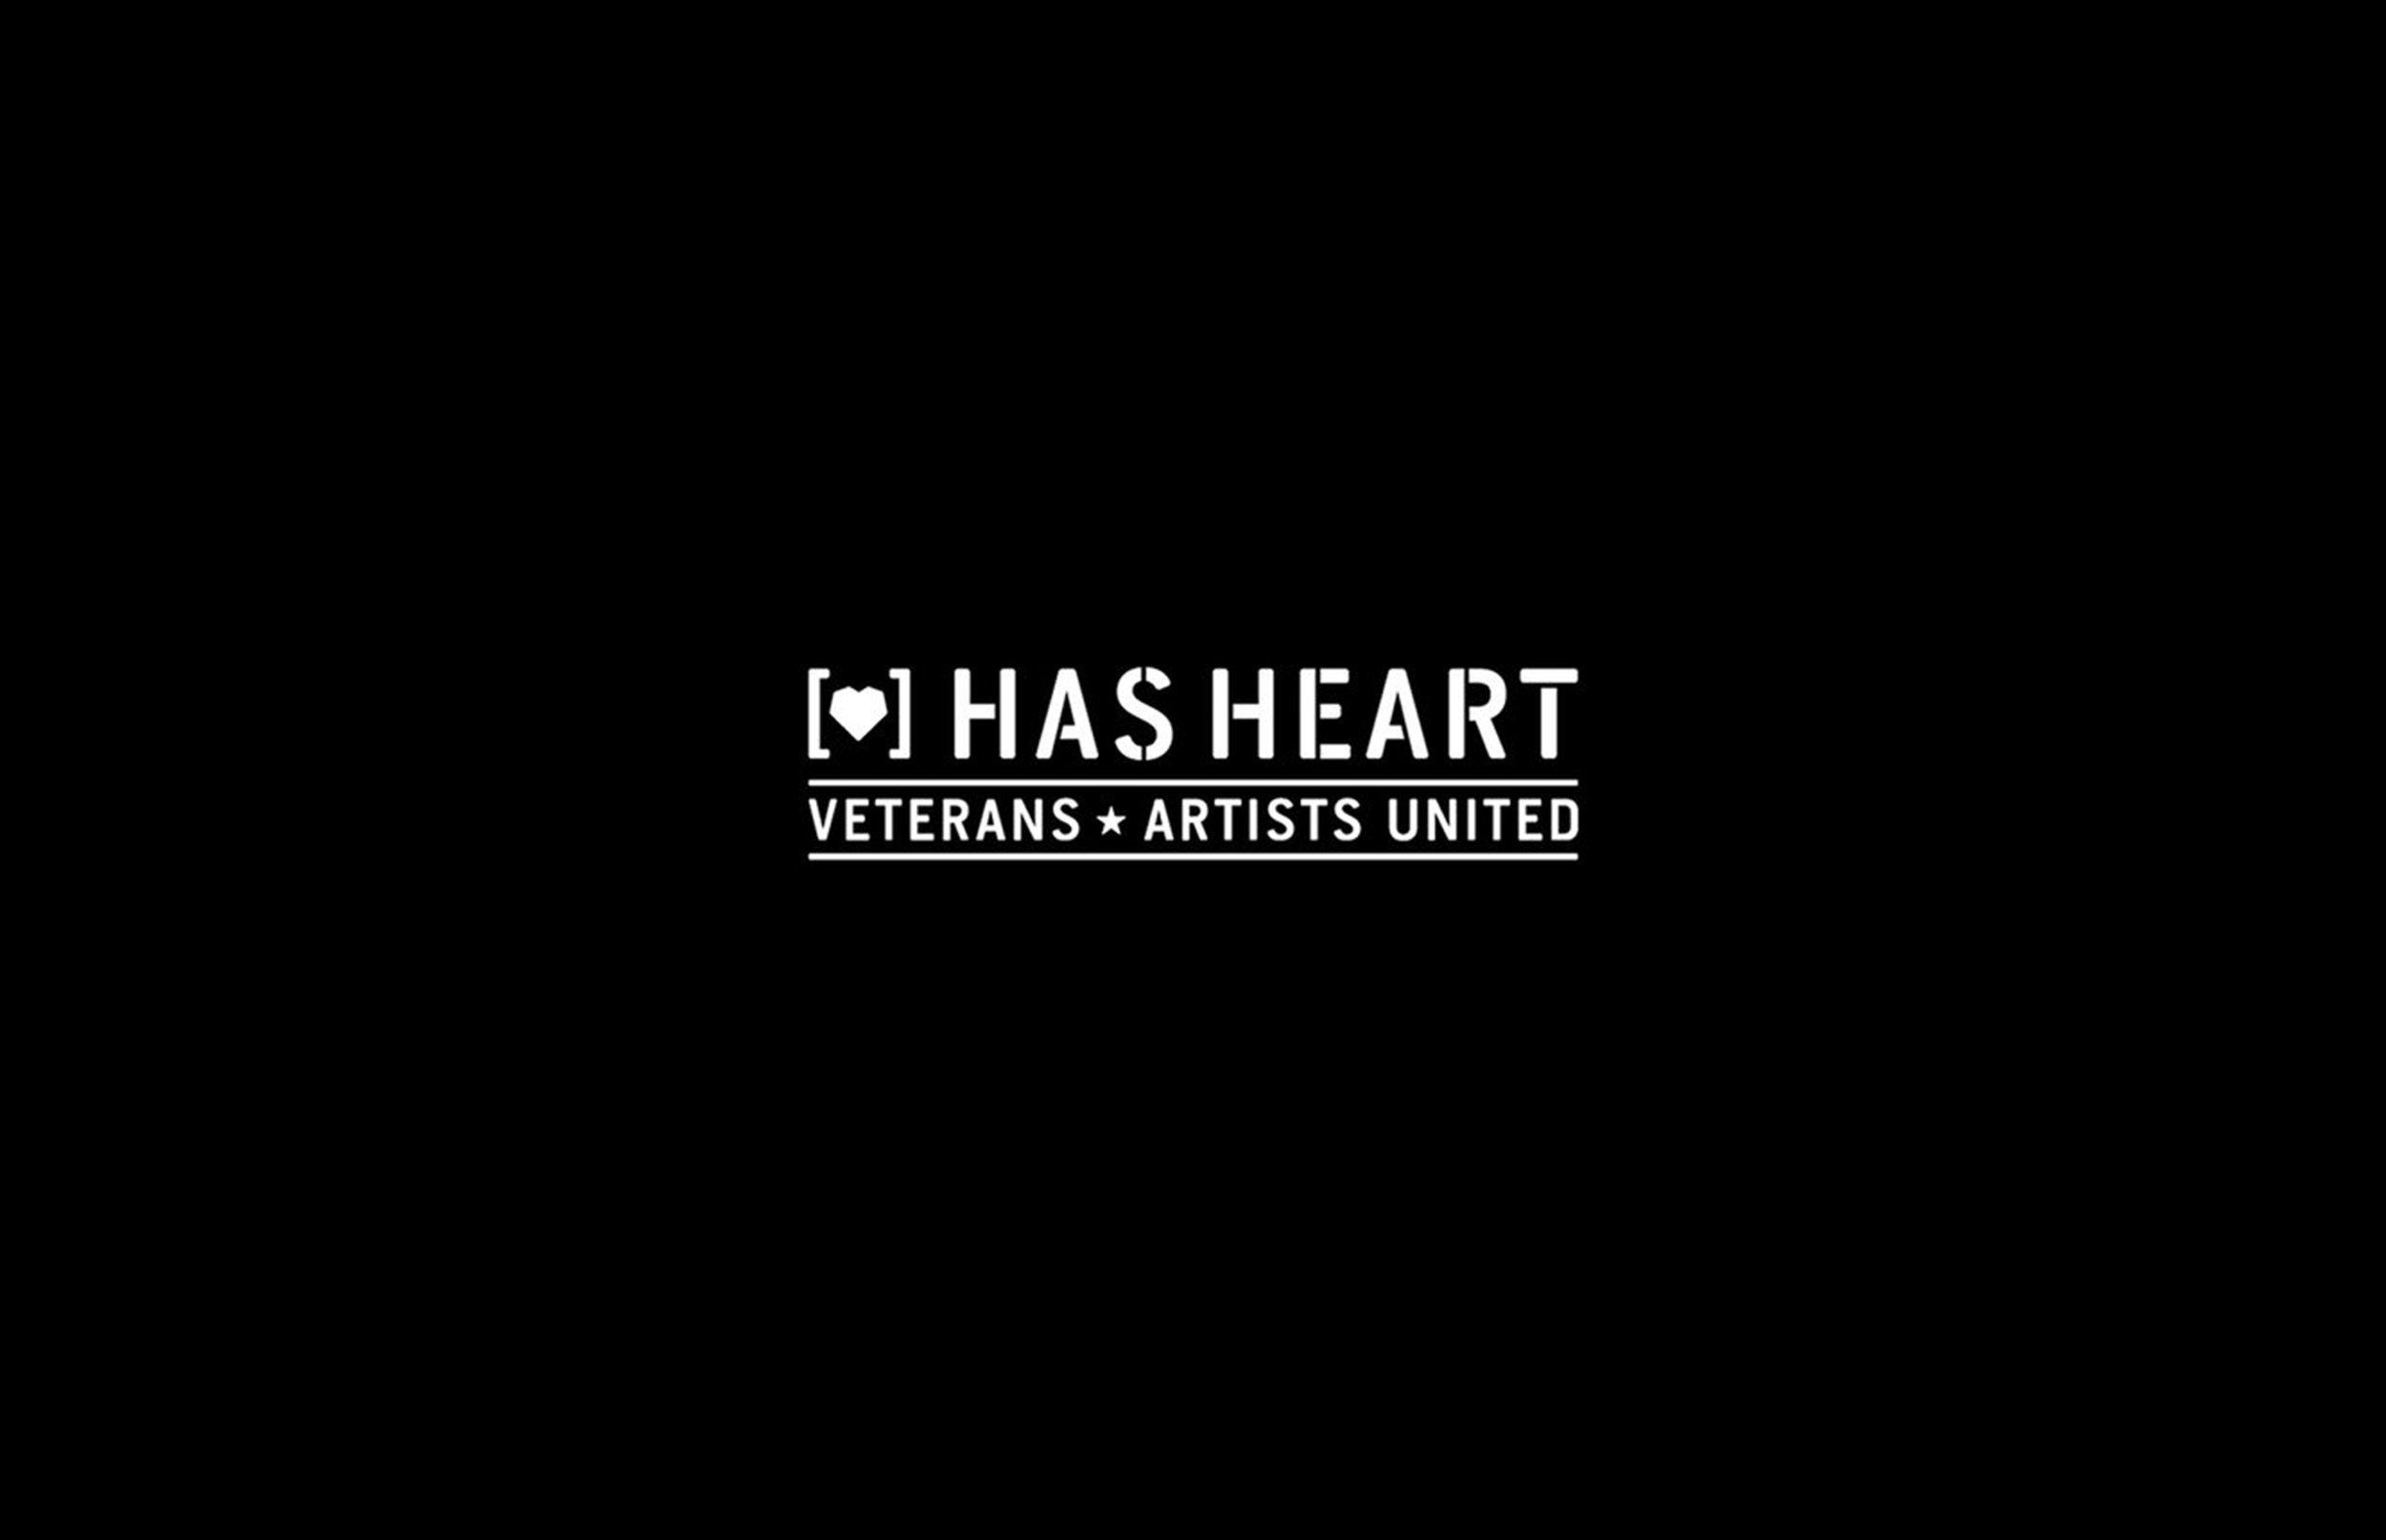 hasheart.jpg